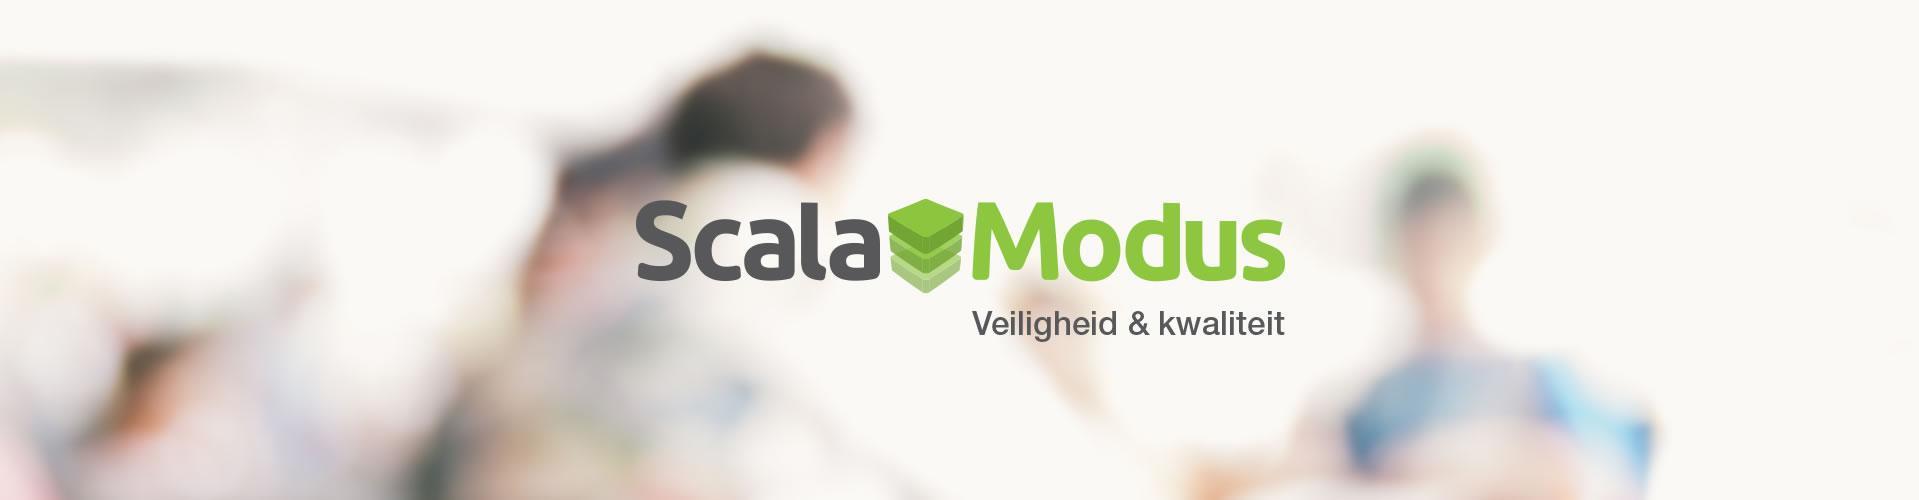 Scala Modus